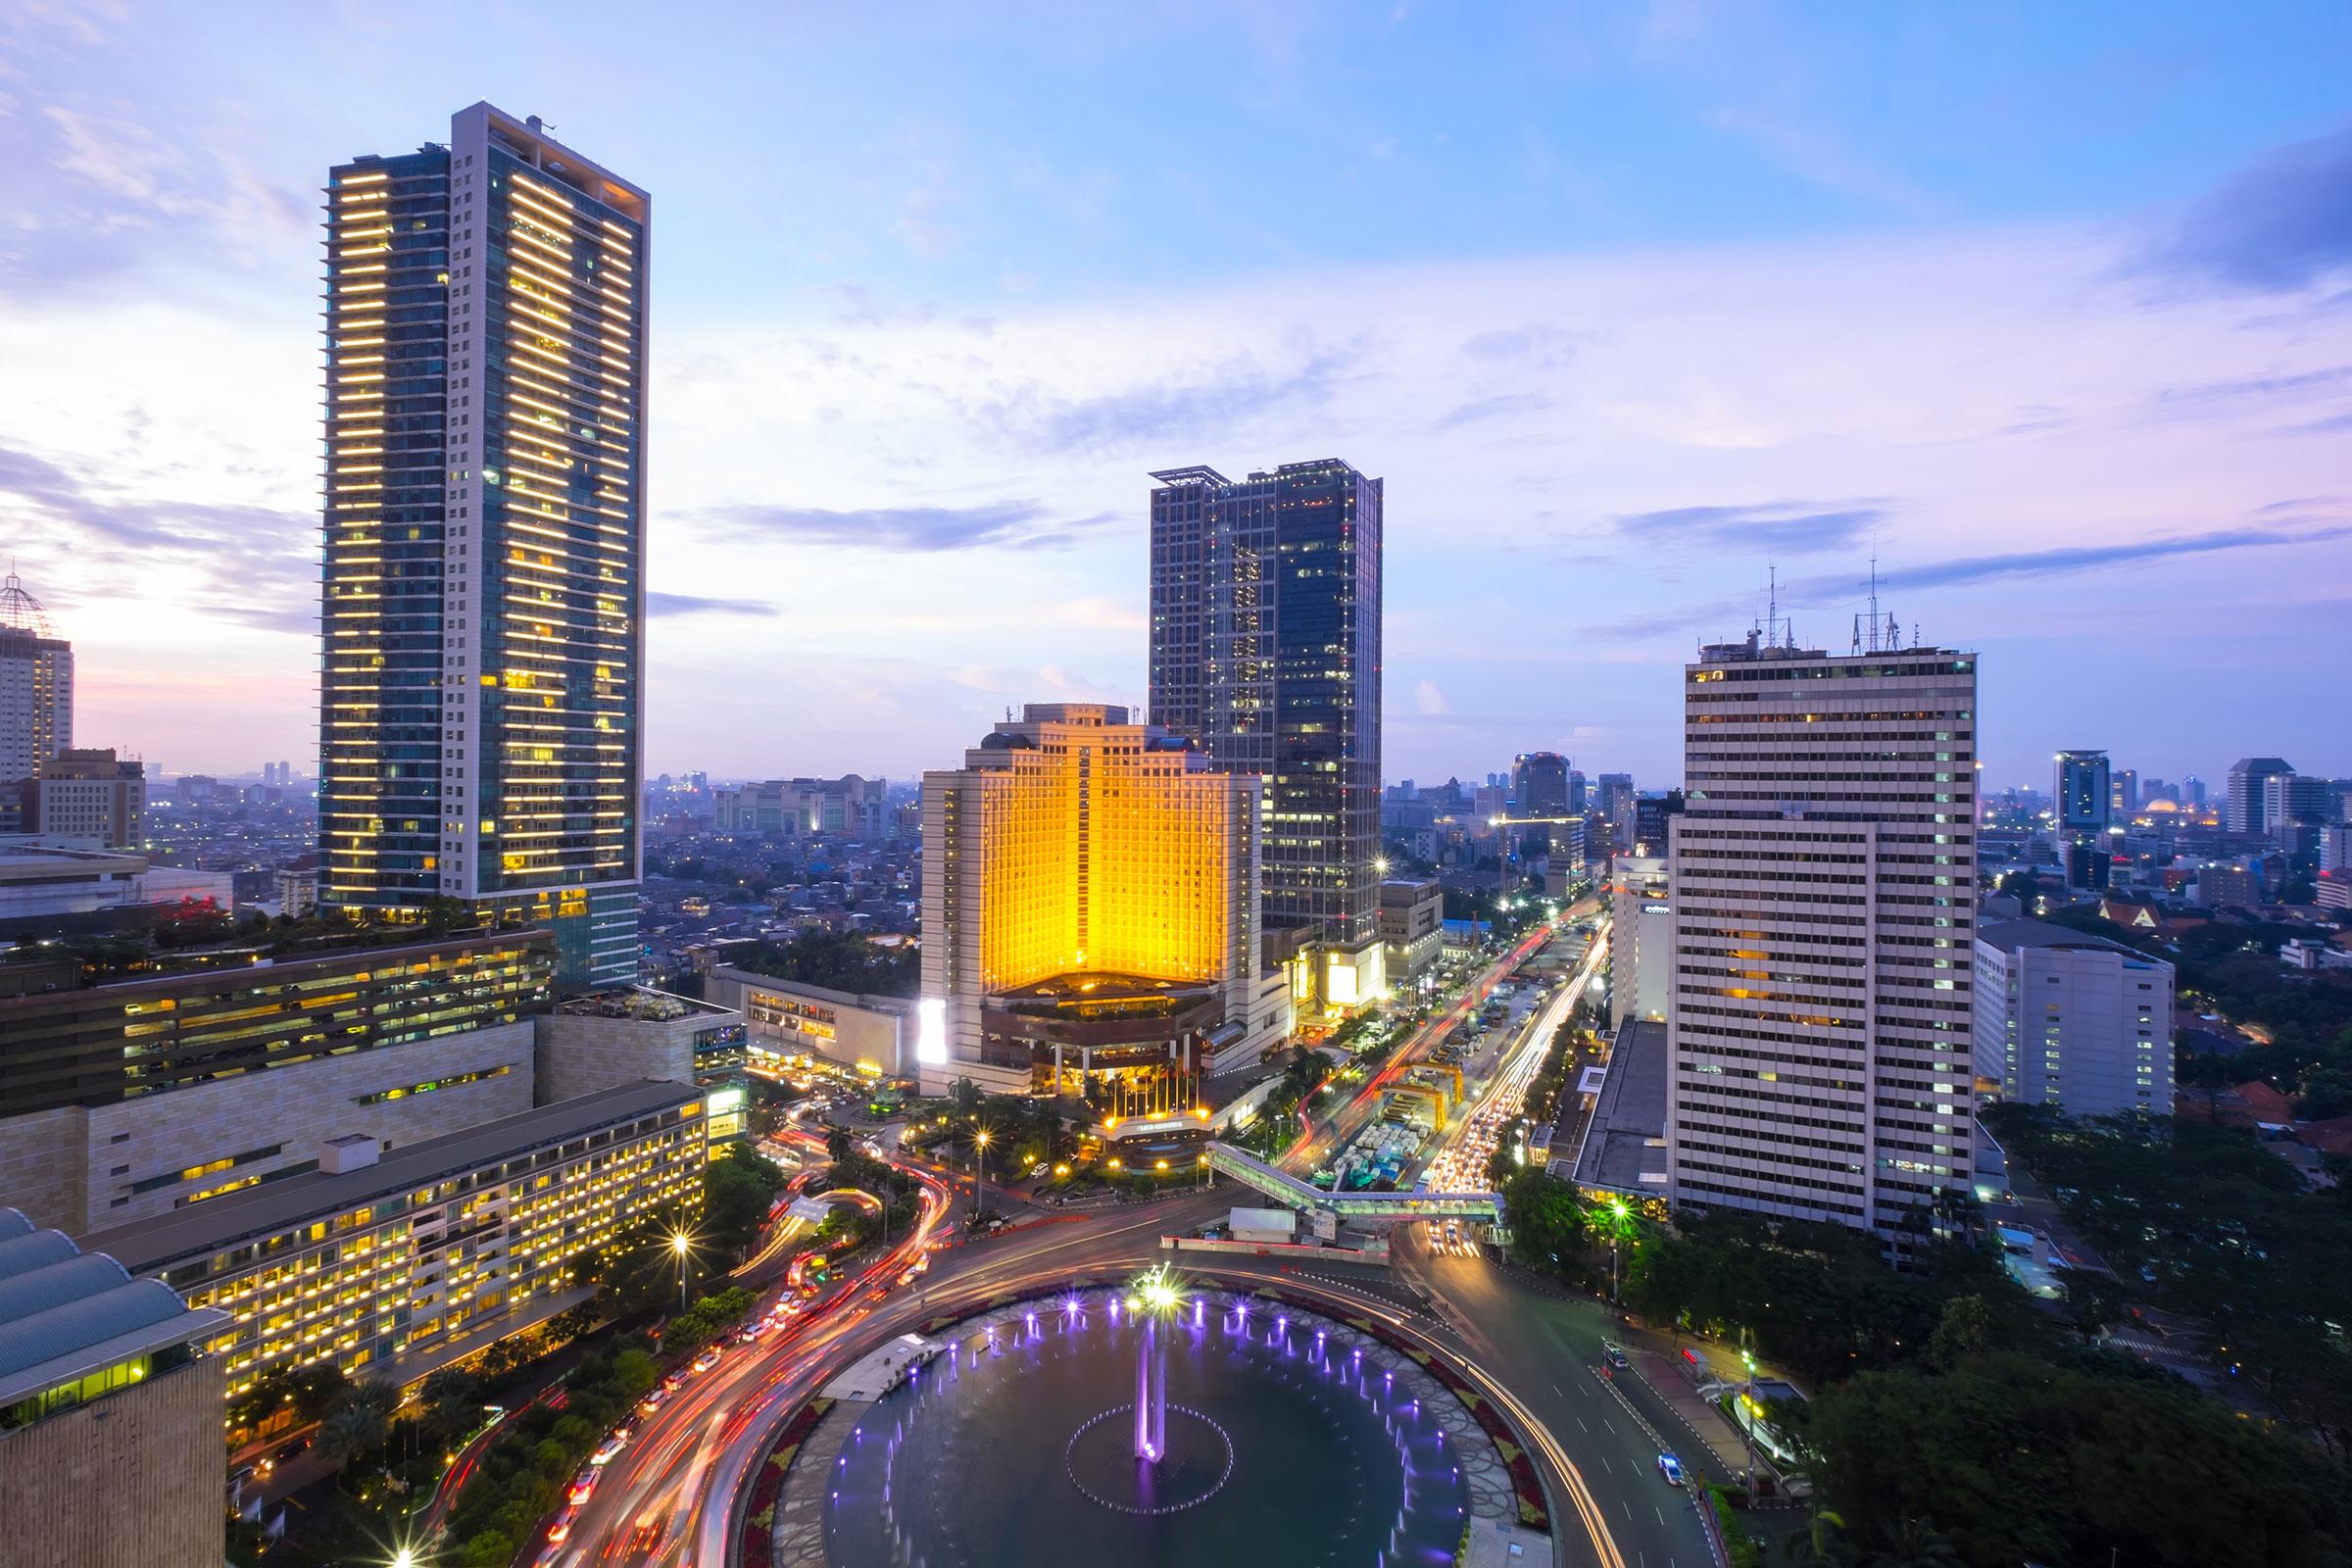 Jakarta city, Indonesia